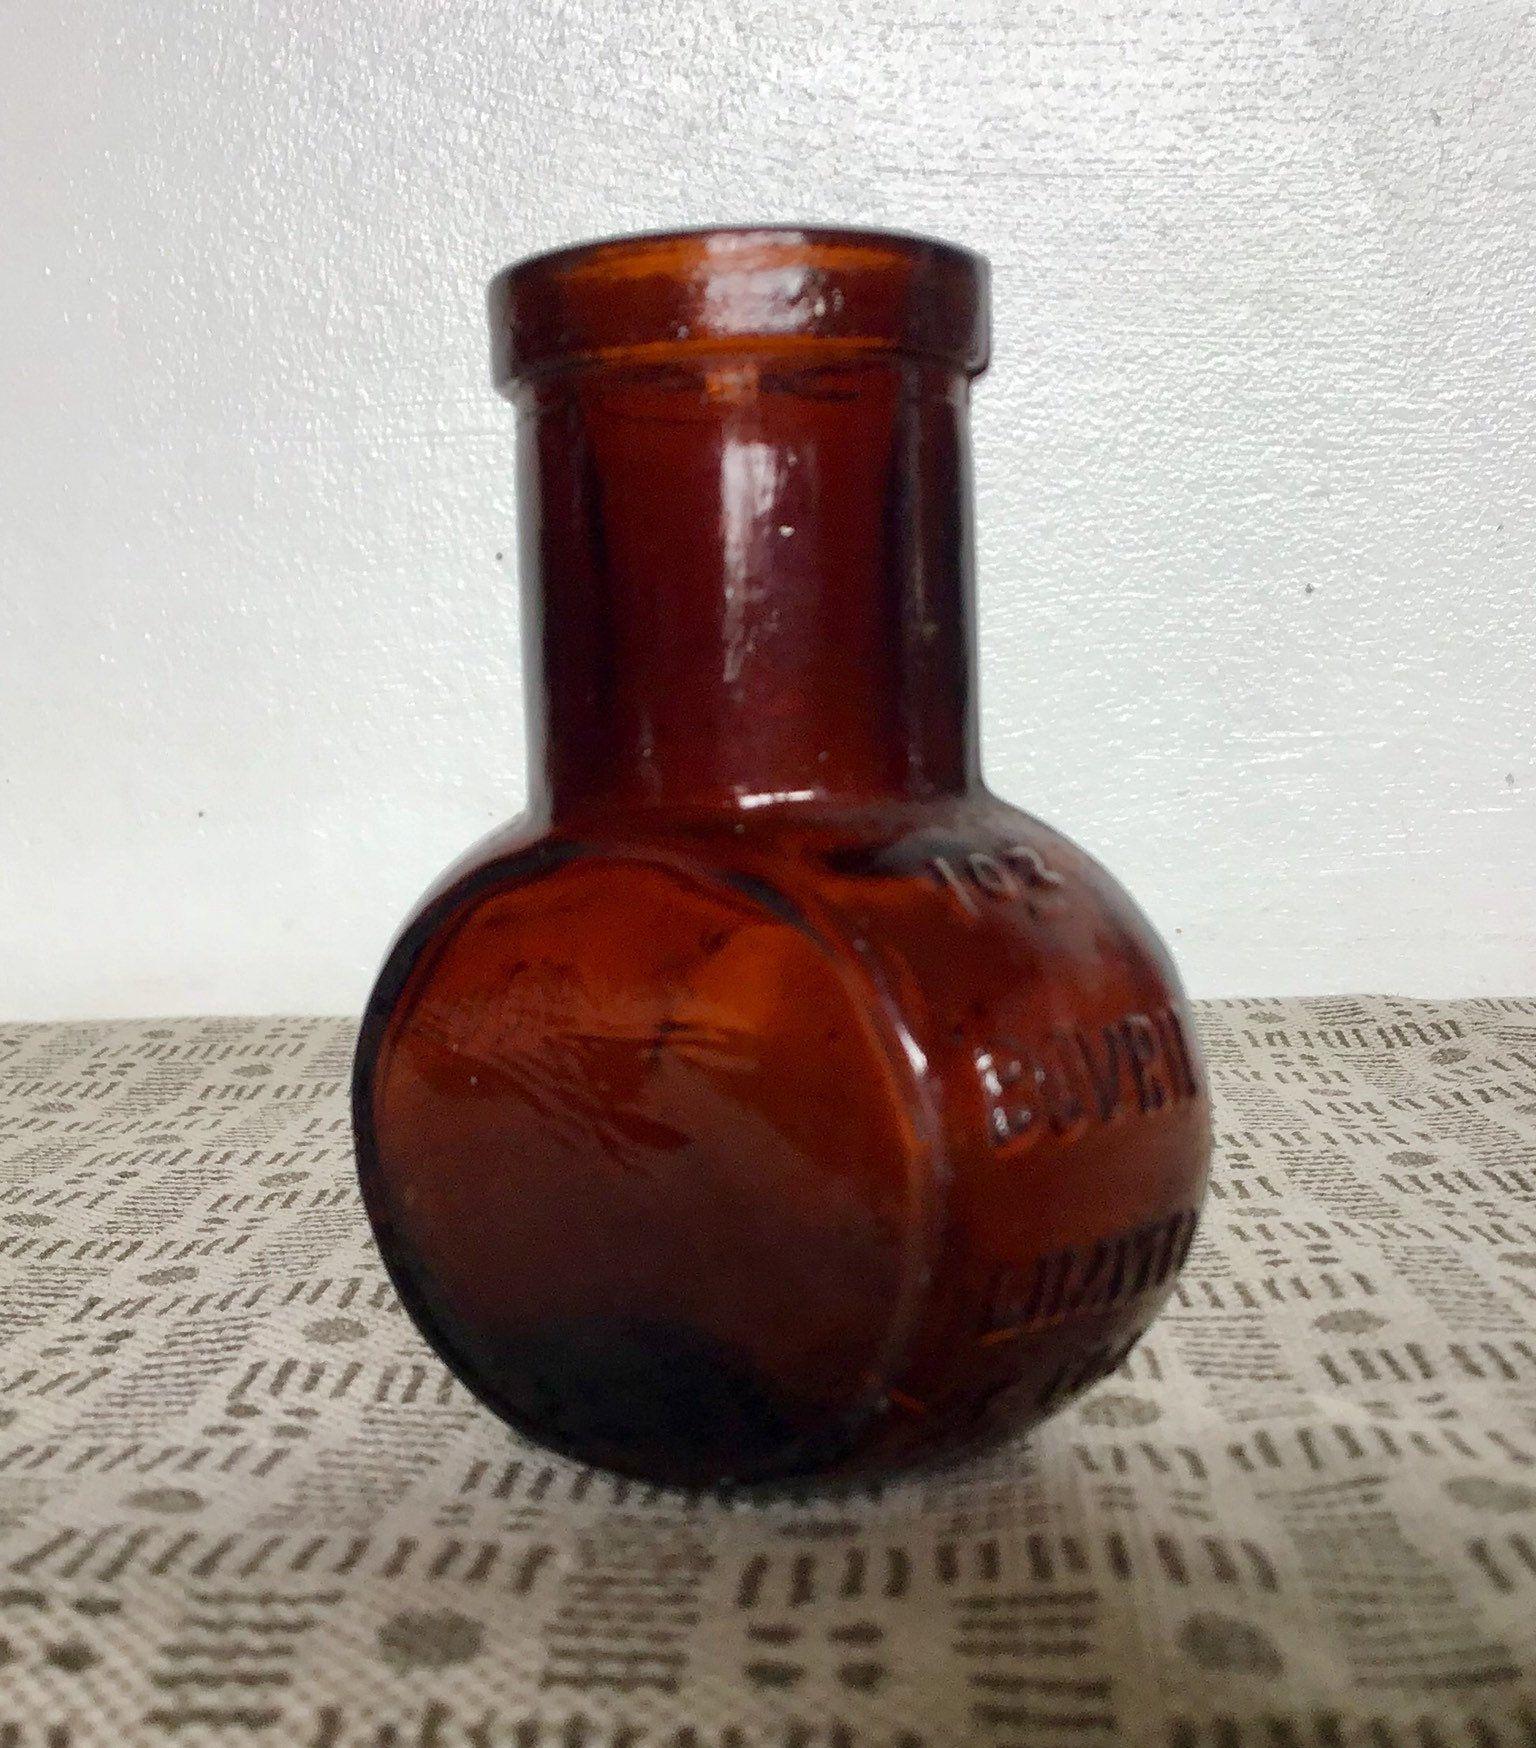 Antique Bovril Jar Rare 1oz Size Amber Glass Jar 1910 S Amber Glass Jars Glass Jars Amber Glass